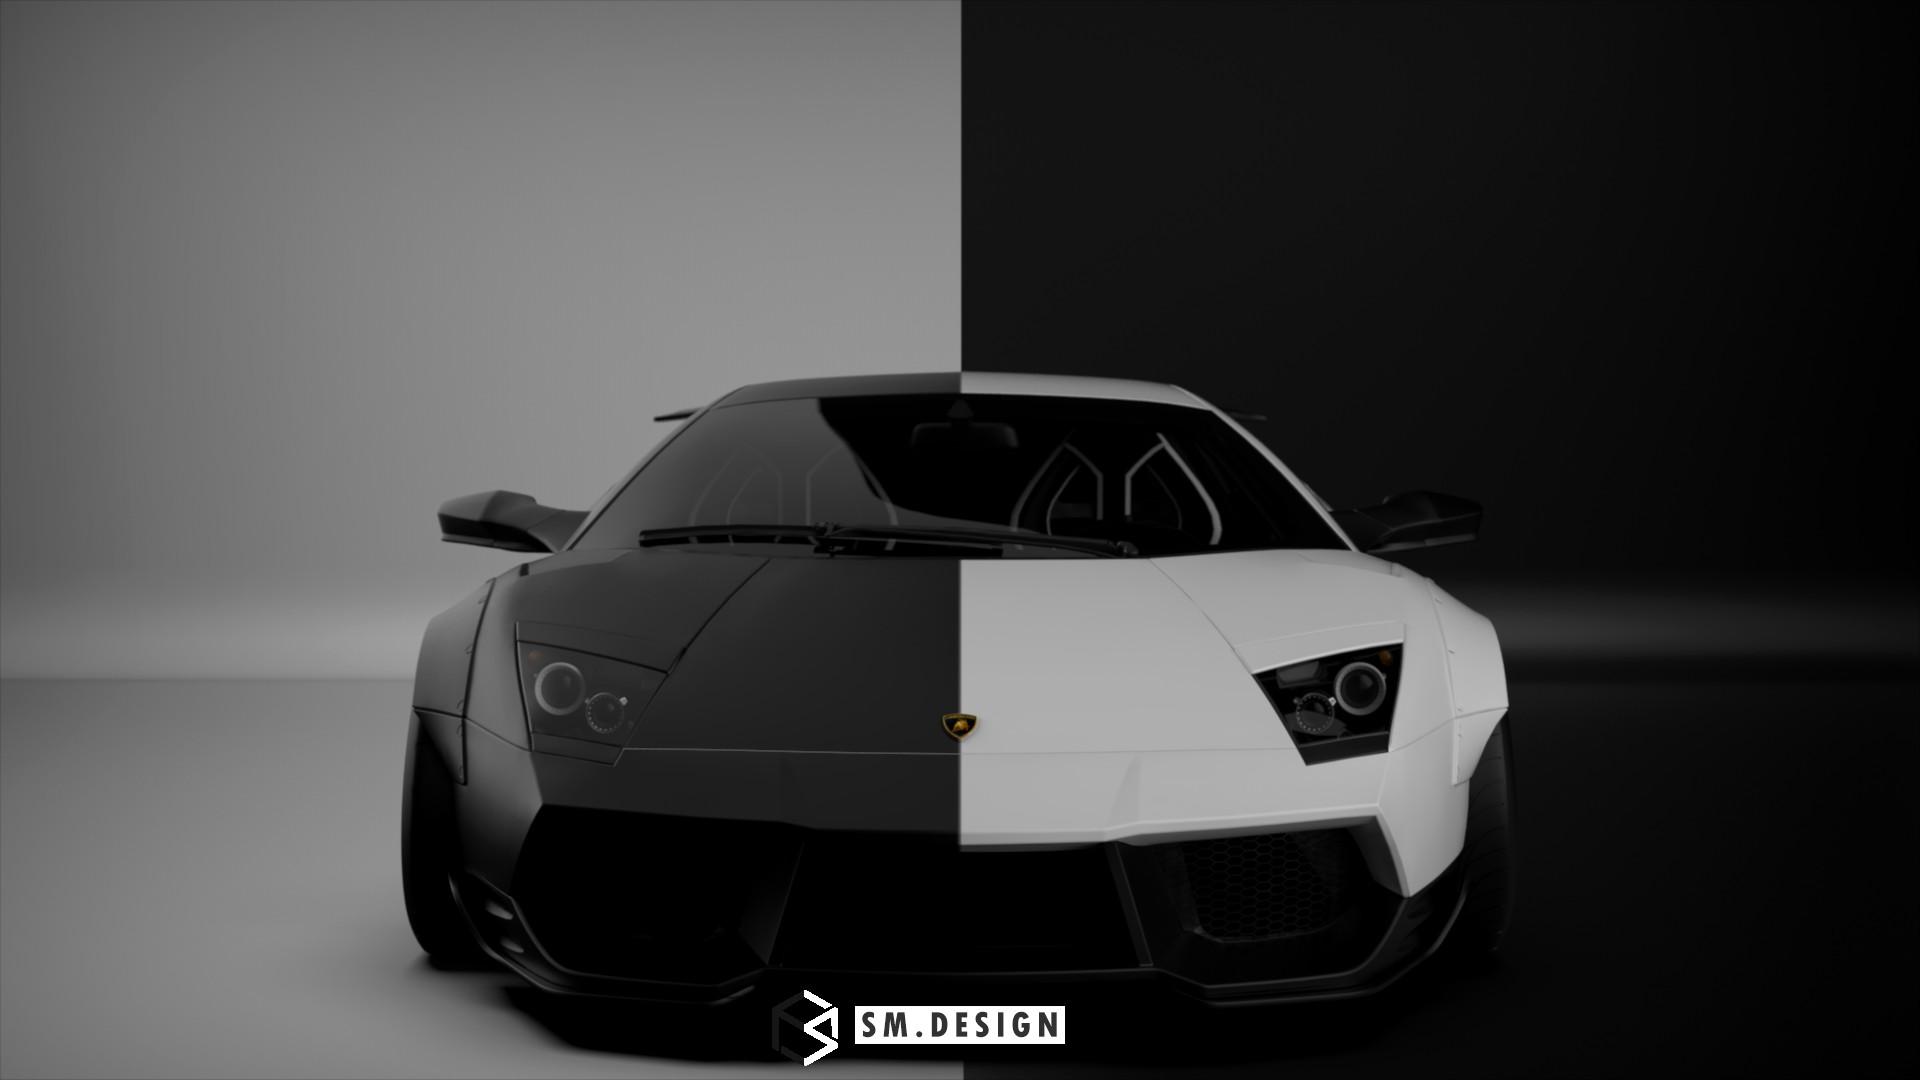 Sm Design Black White Liberty Walk Lamborghini Murcielago On